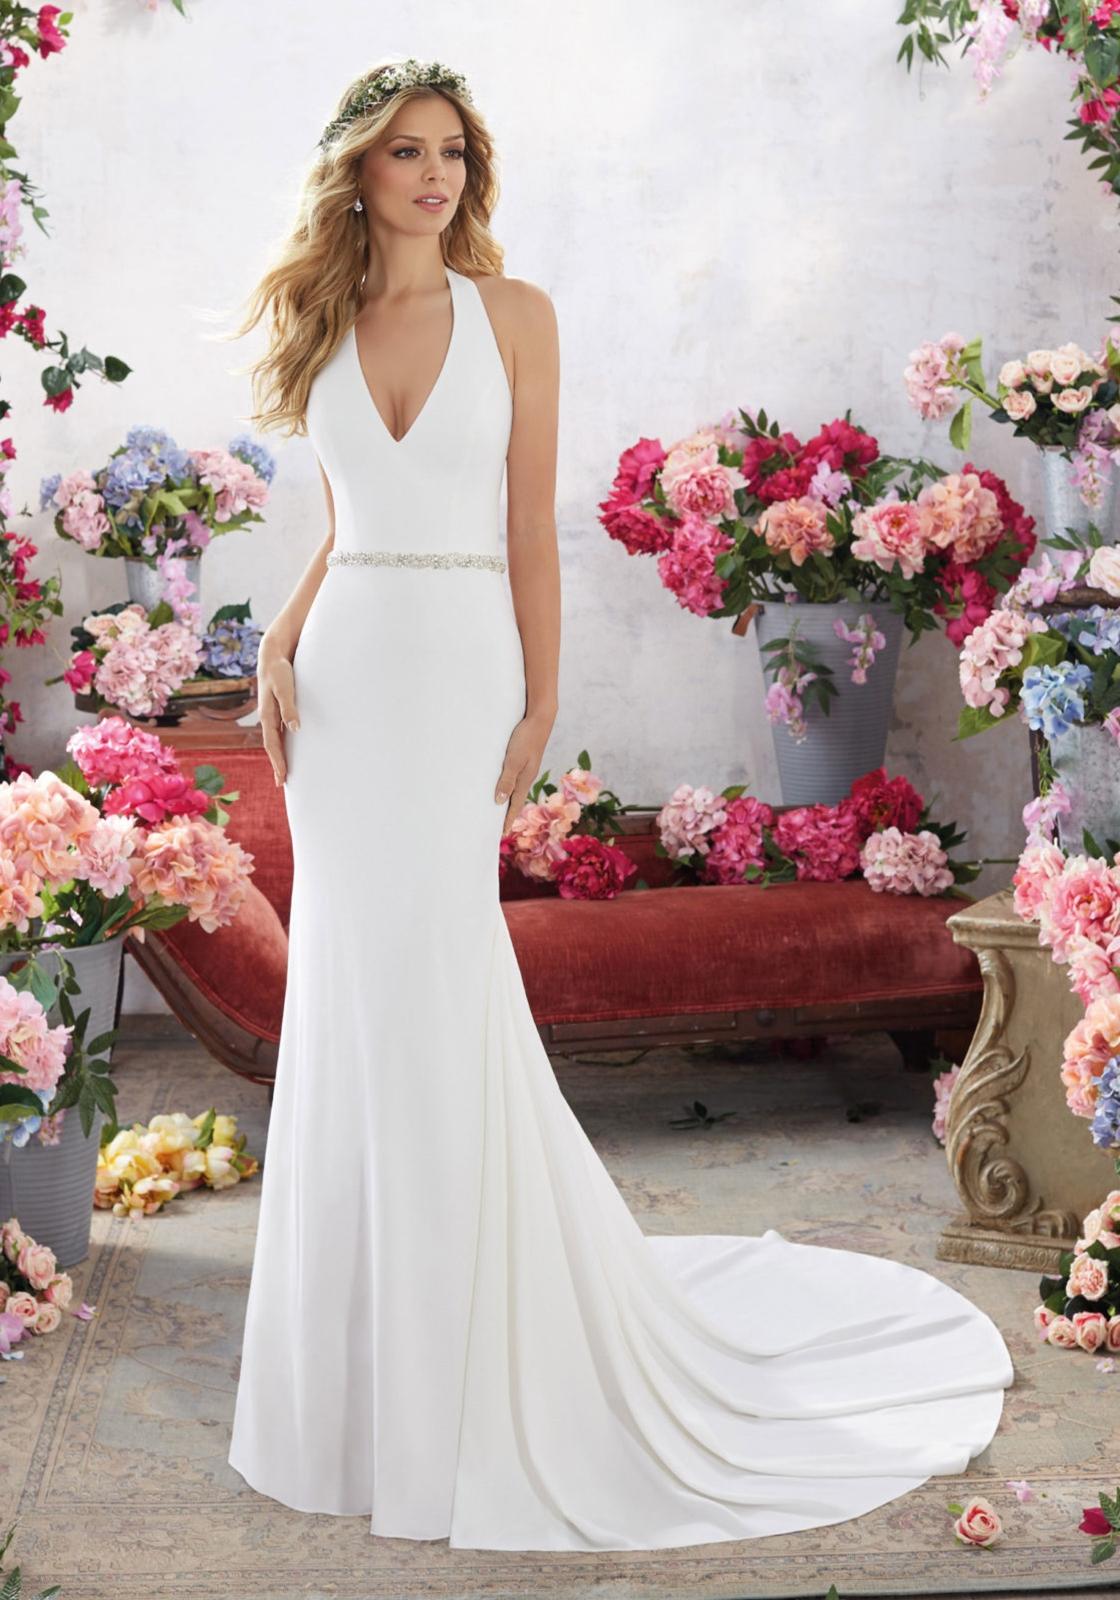 Voyage by Mori Lee Wedding Dress Style 6855/Melanie   House of Brides